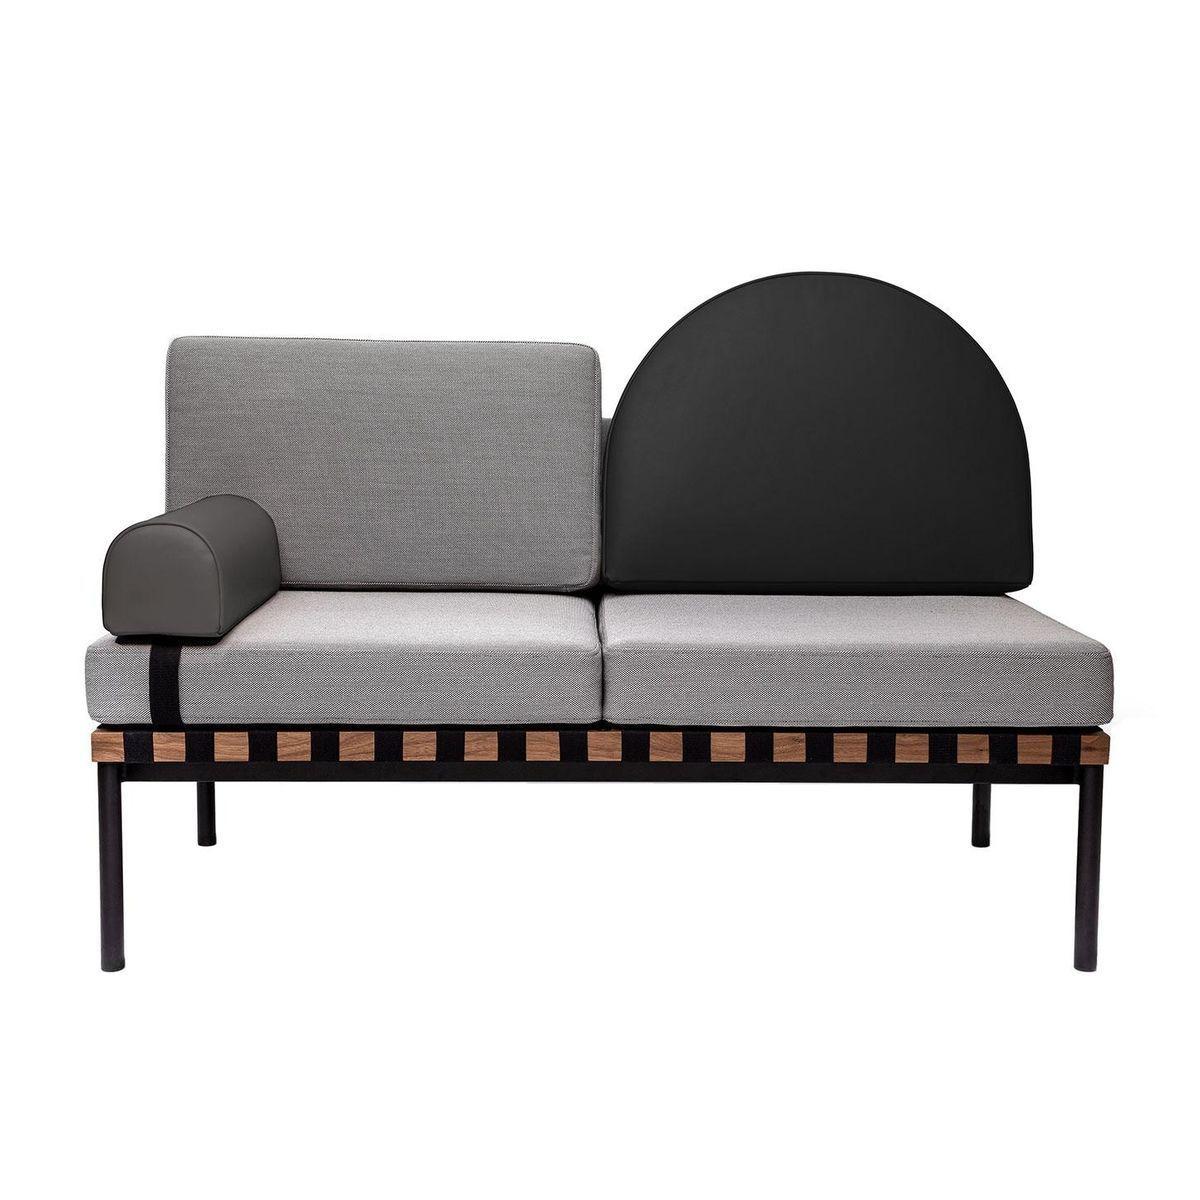 grid 2 zits sofa petite friture. Black Bedroom Furniture Sets. Home Design Ideas